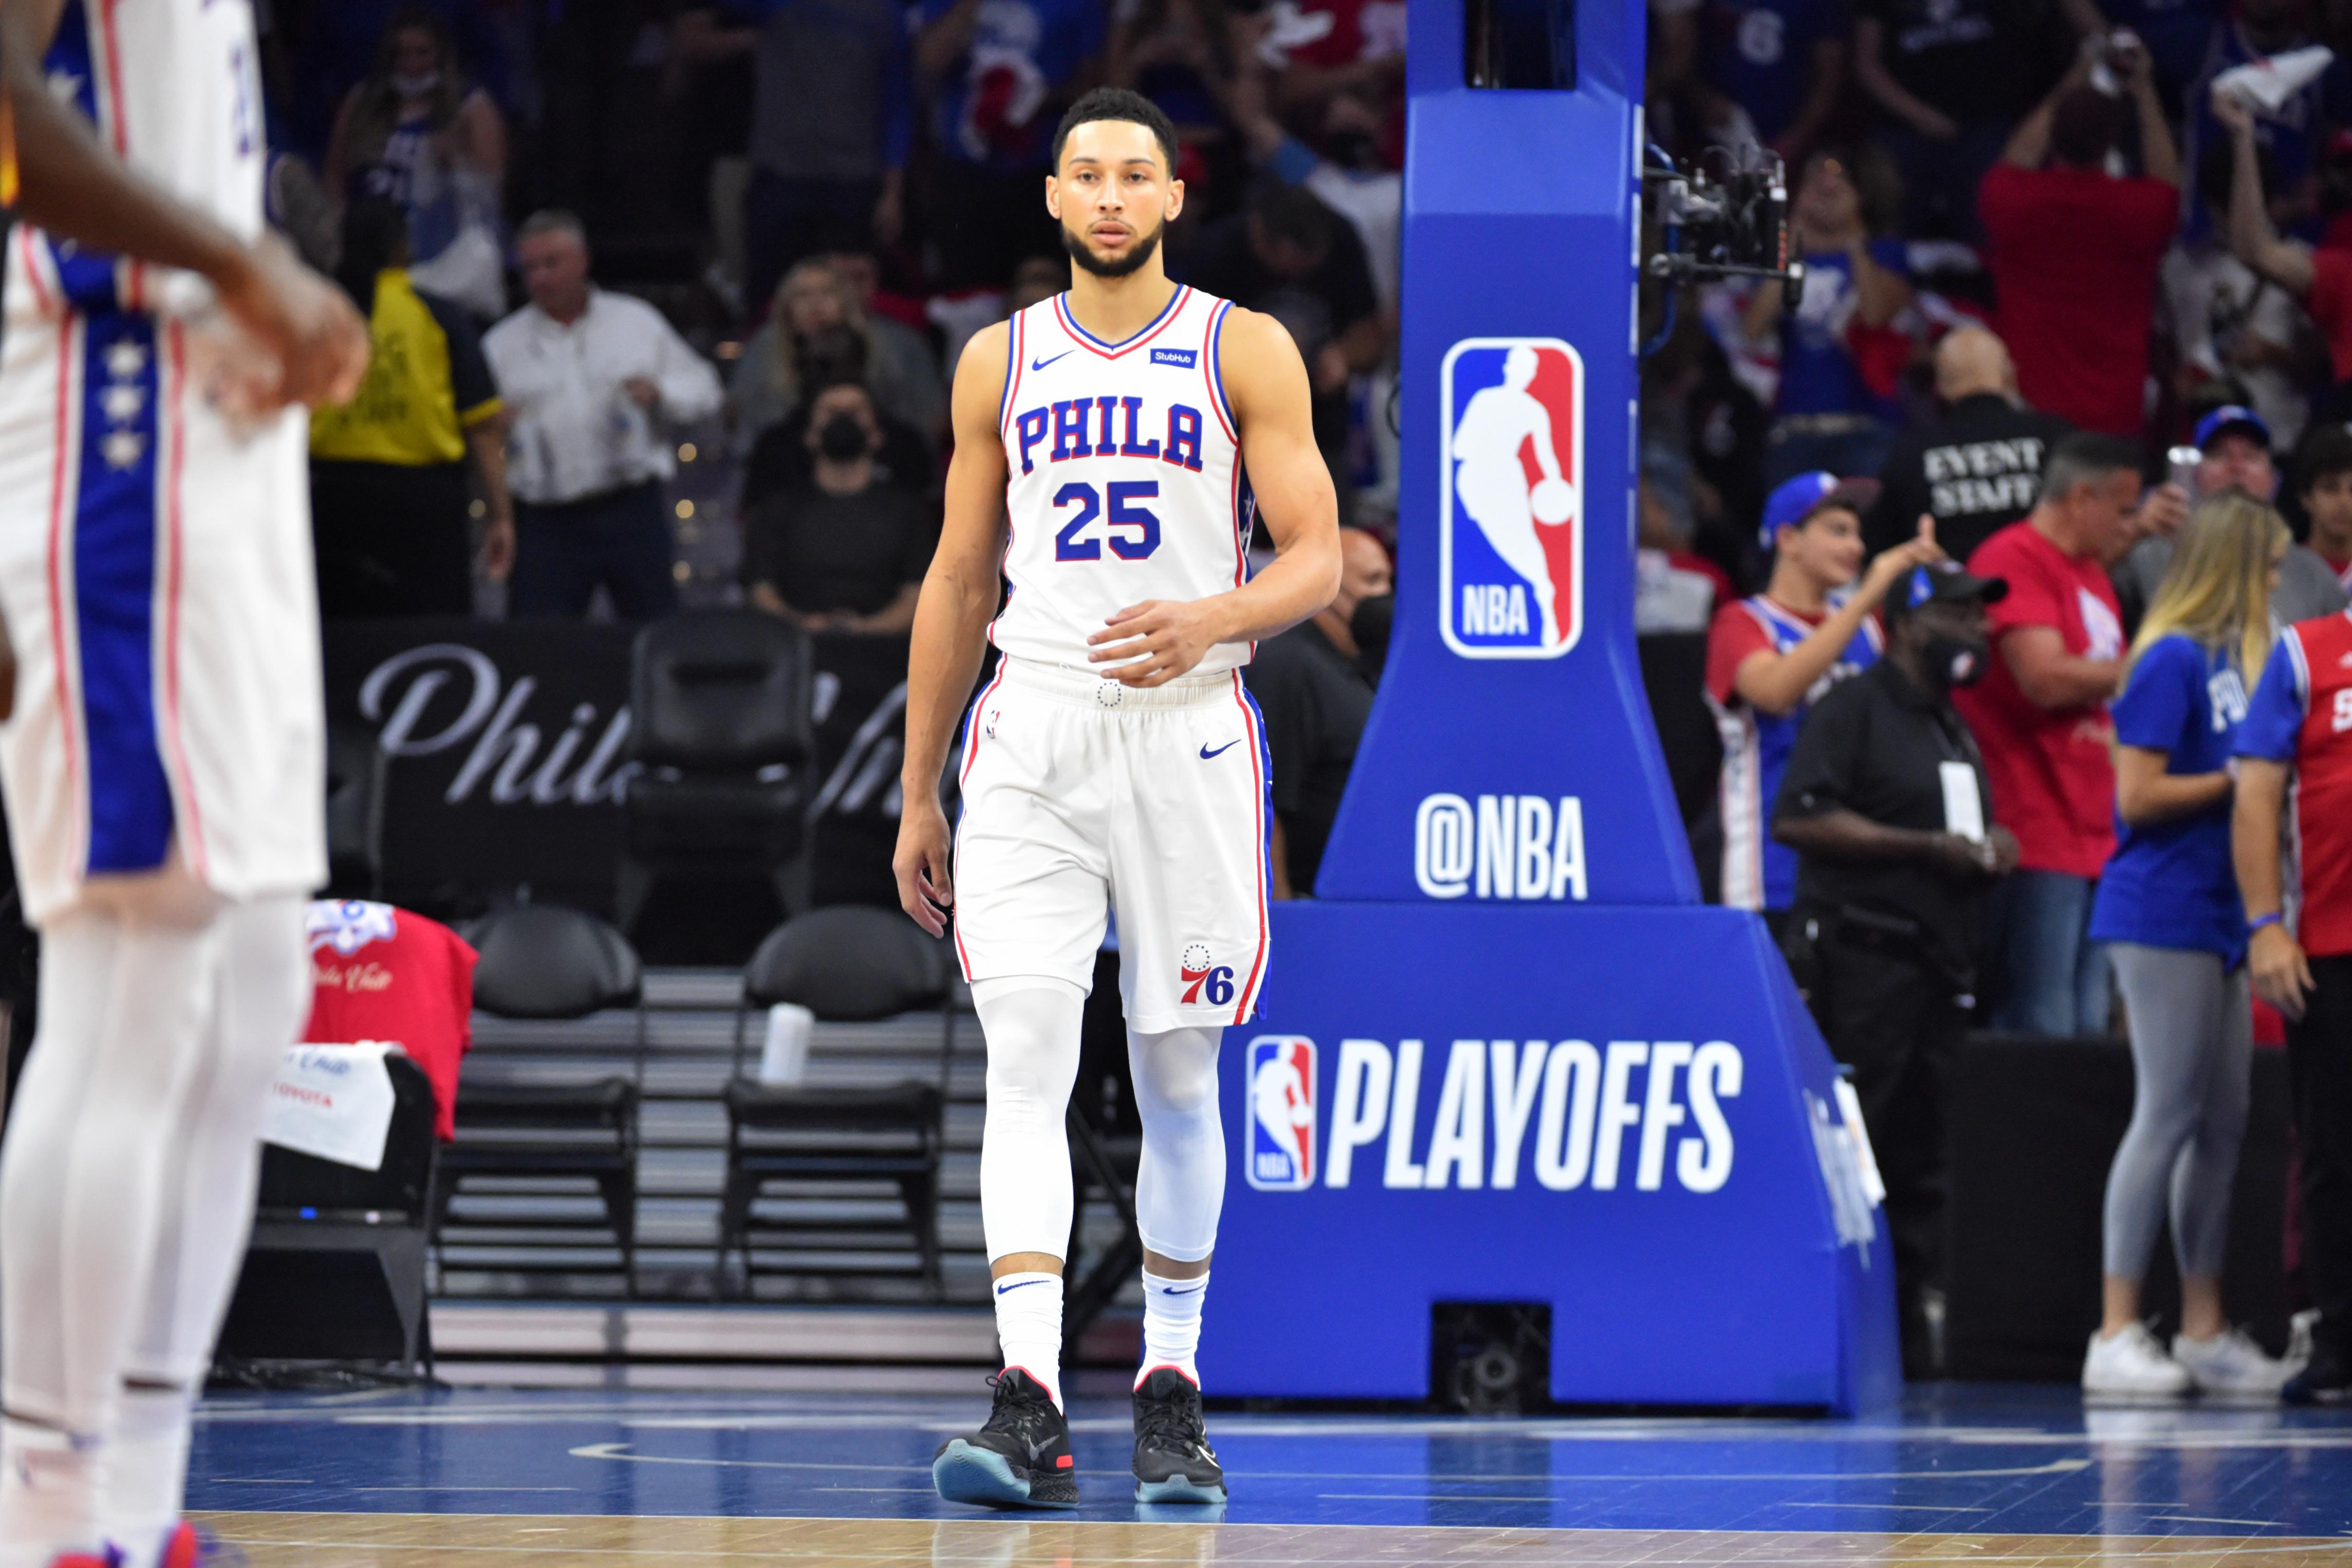 2021 NBA Playoffs - Atlanta Hawks v Philadelphia 76ers